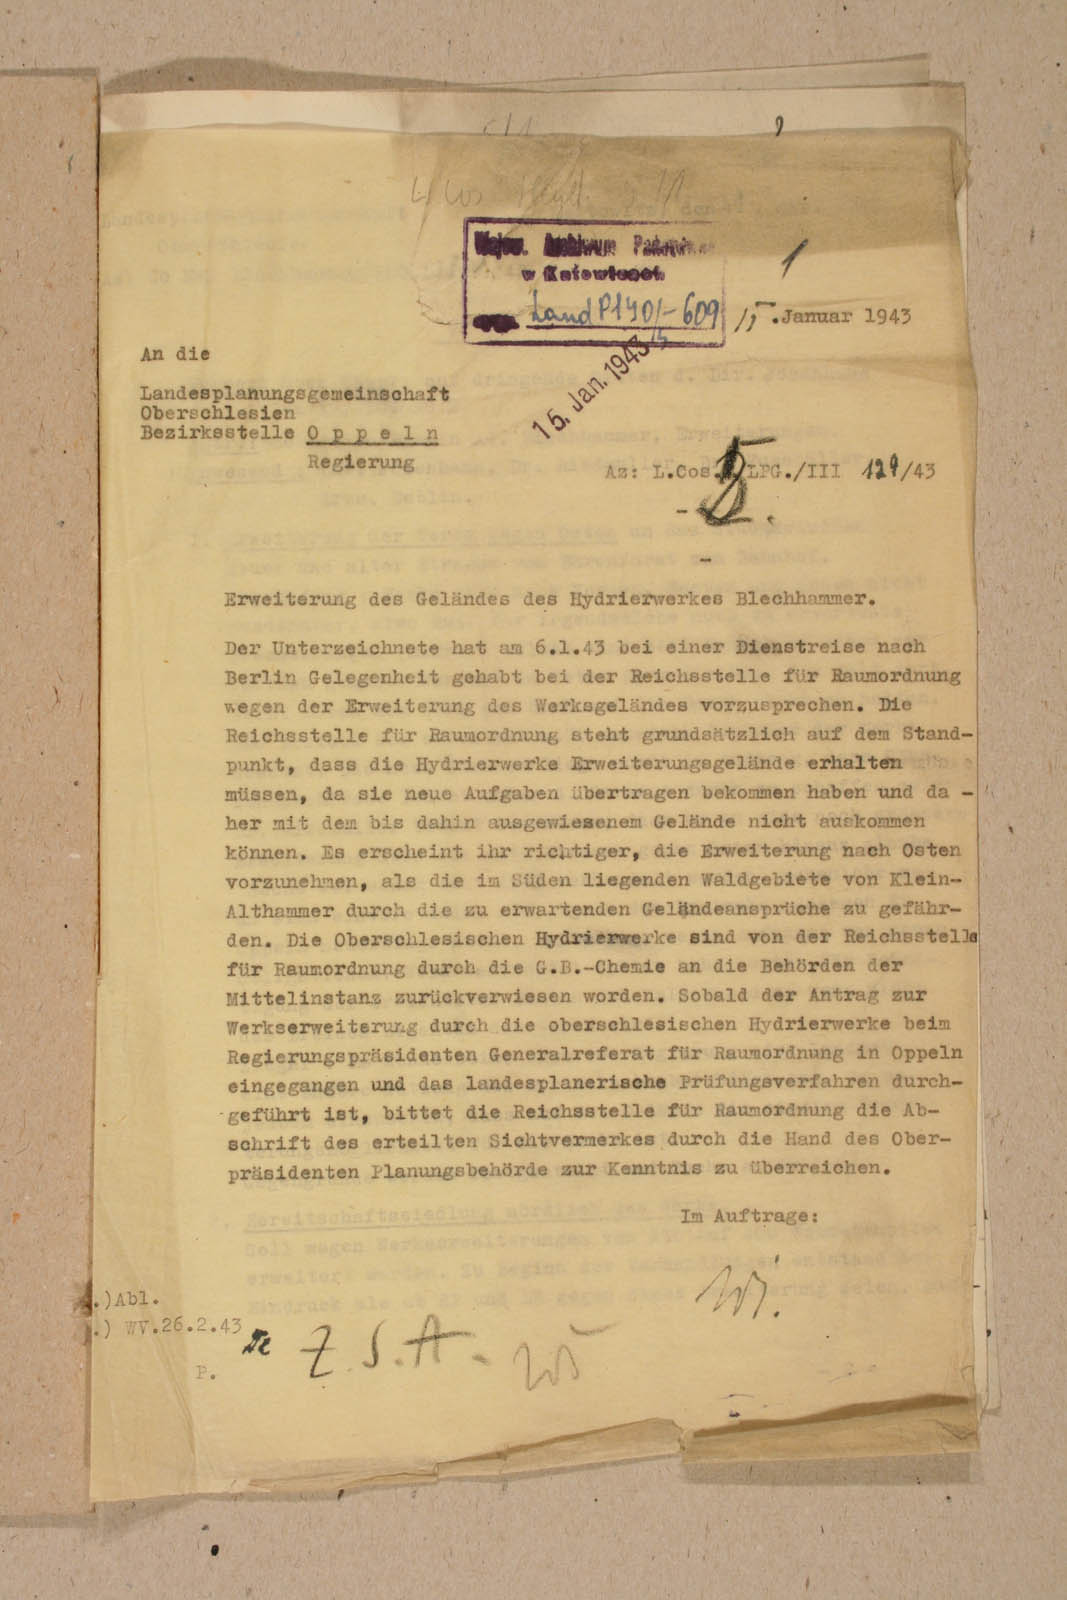 Archiwum Panstwowe w Katowicach Land Pl 12 120 609 01